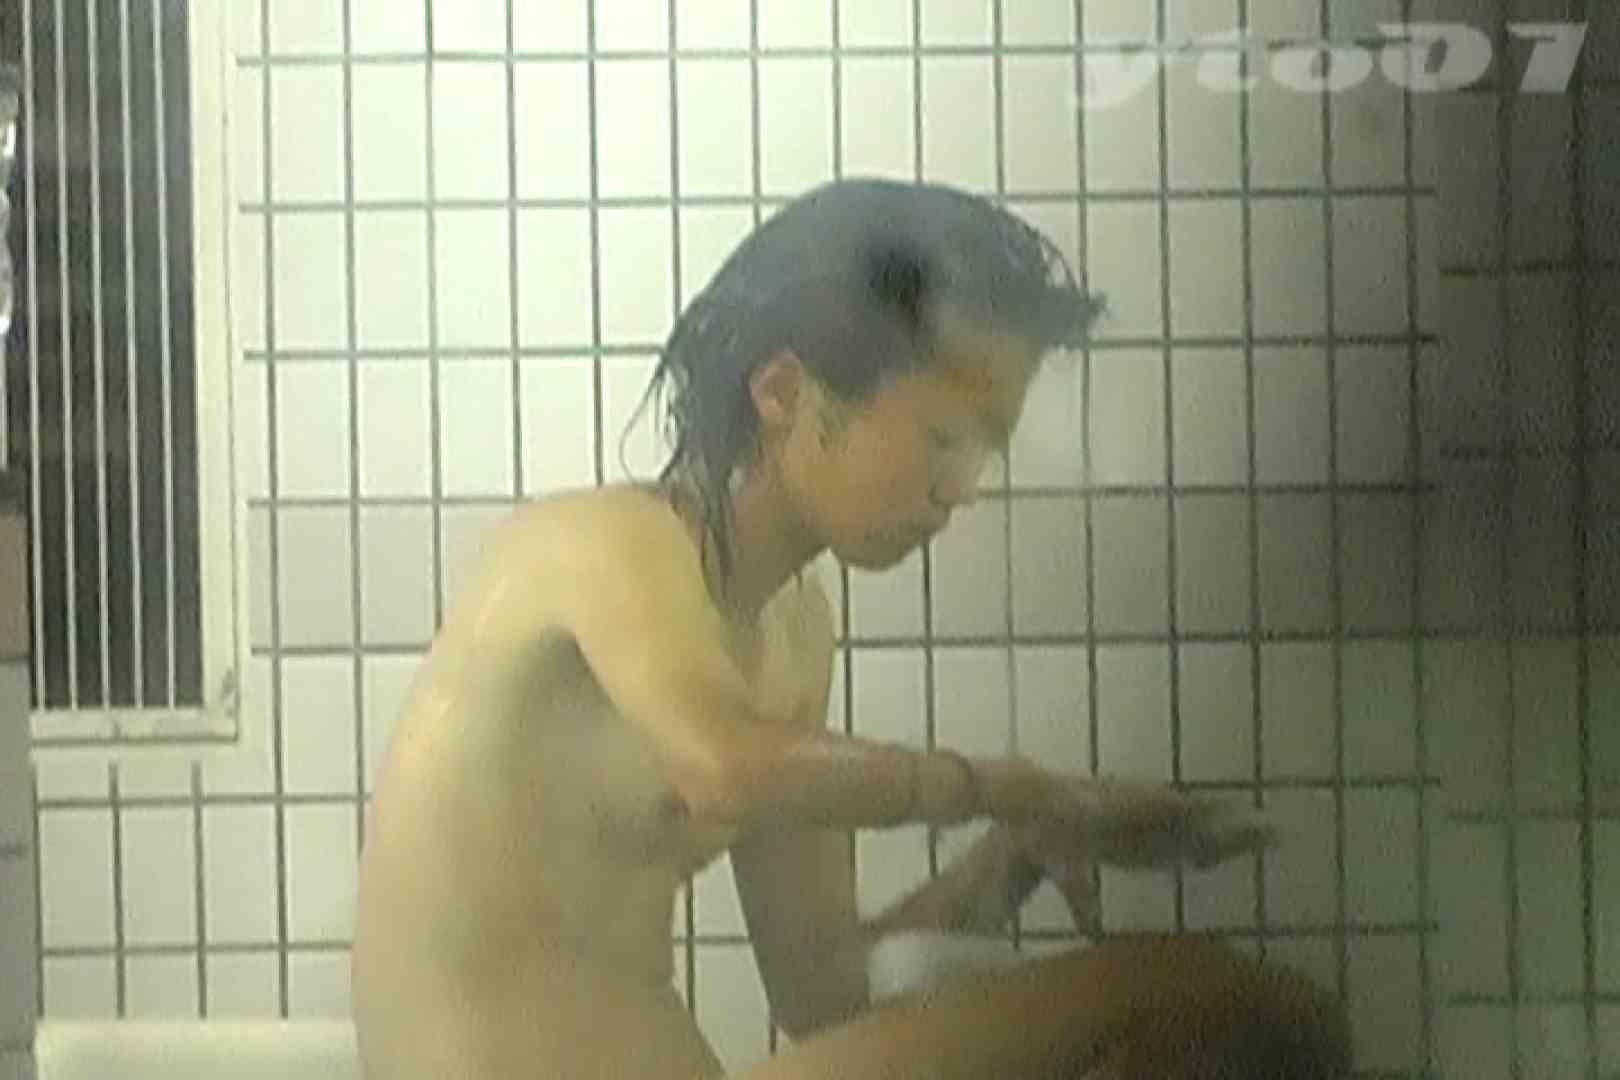 ▲復活限定▲合宿ホテル女風呂盗撮 Vol.07 0 | 0  92画像 89